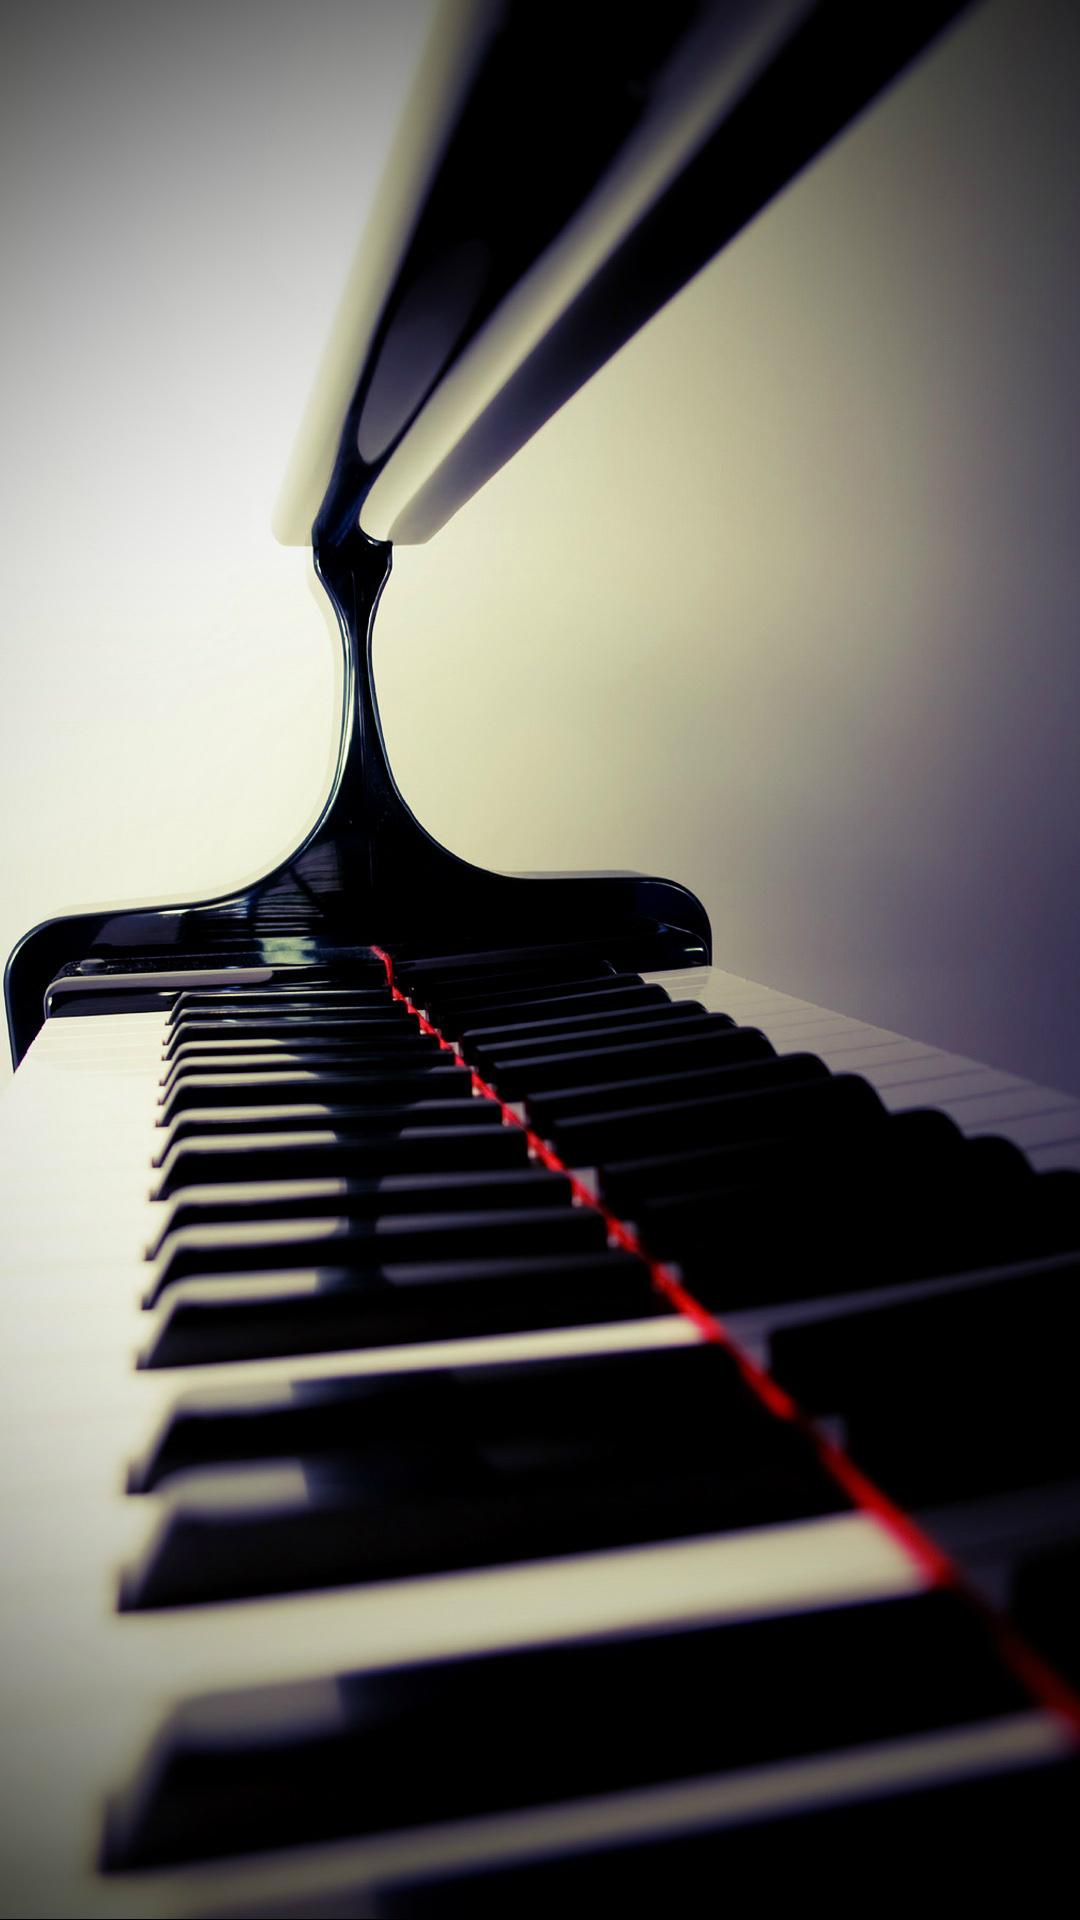 piano-keys-closeup-iphone-6-wallpaper-ilikewallpaper_com